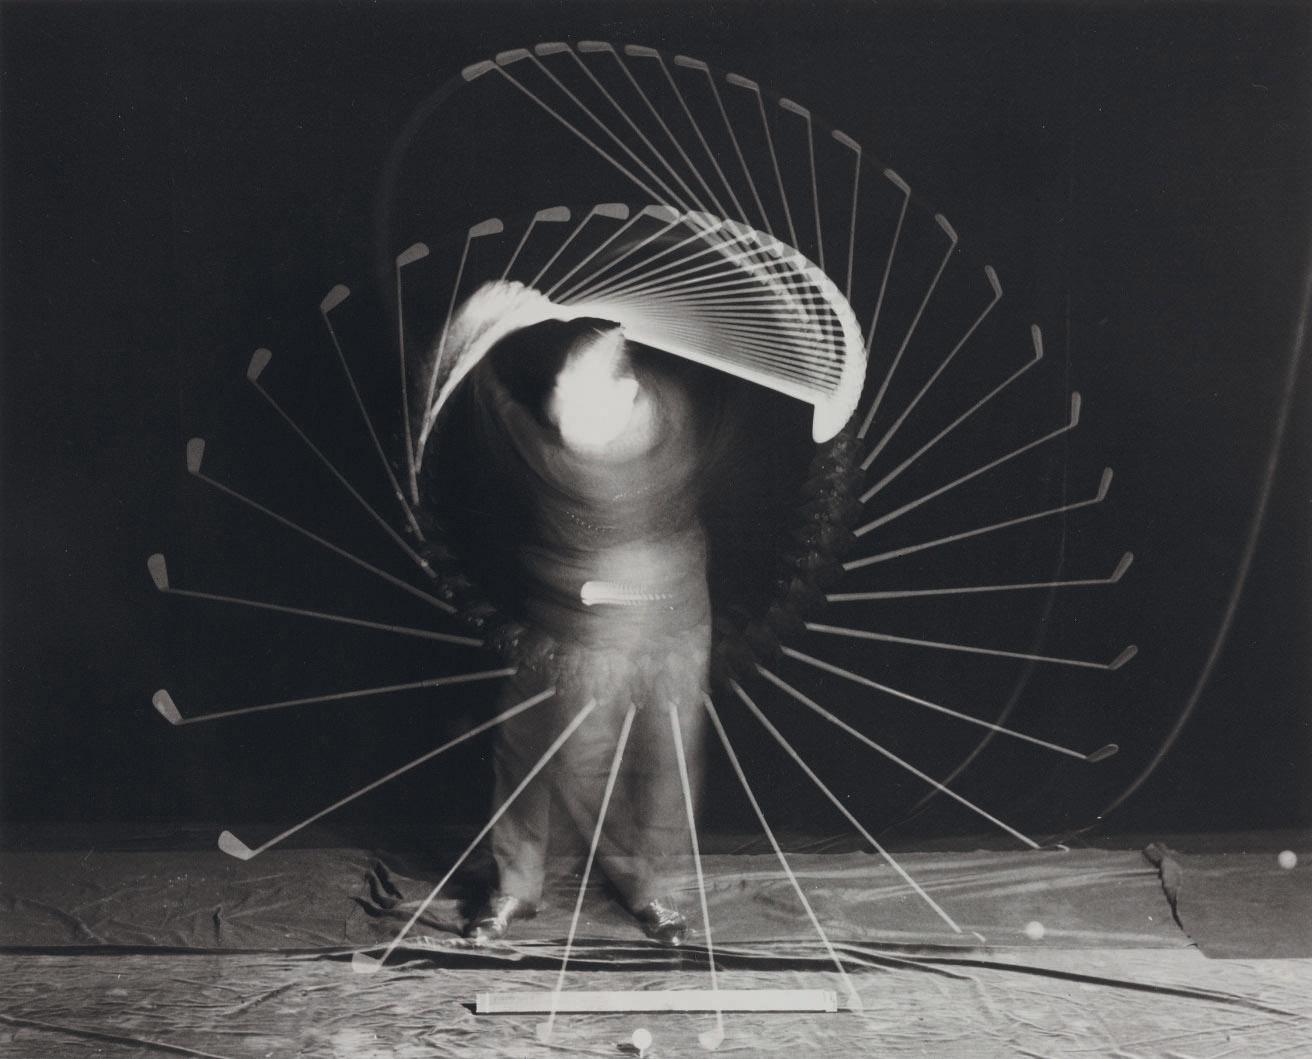 Golf Swing, 1938